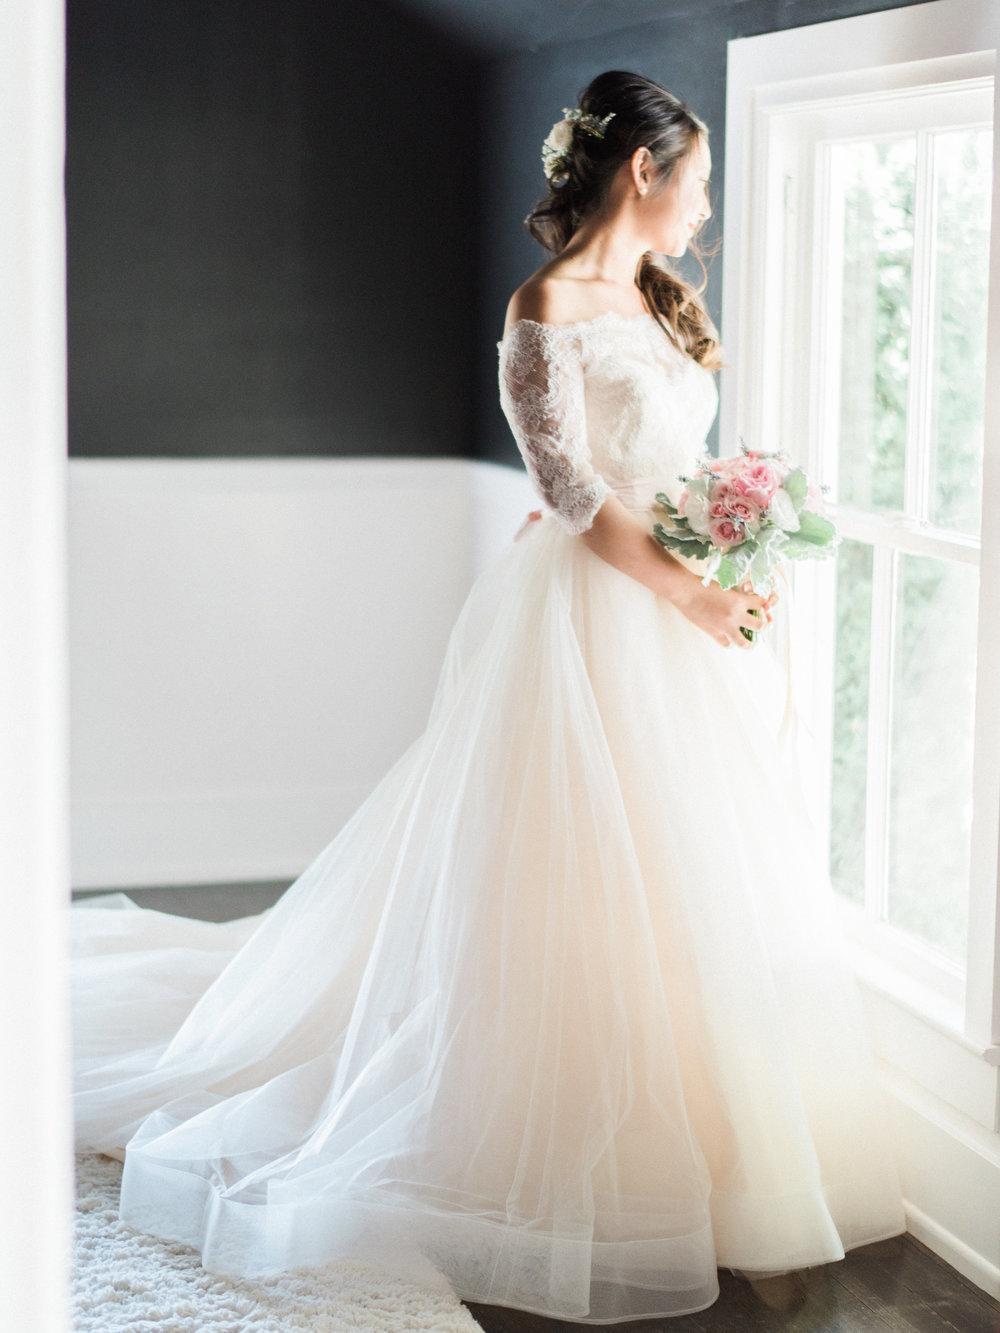 tiffanyandalexandre-wedding-267-2.jpg